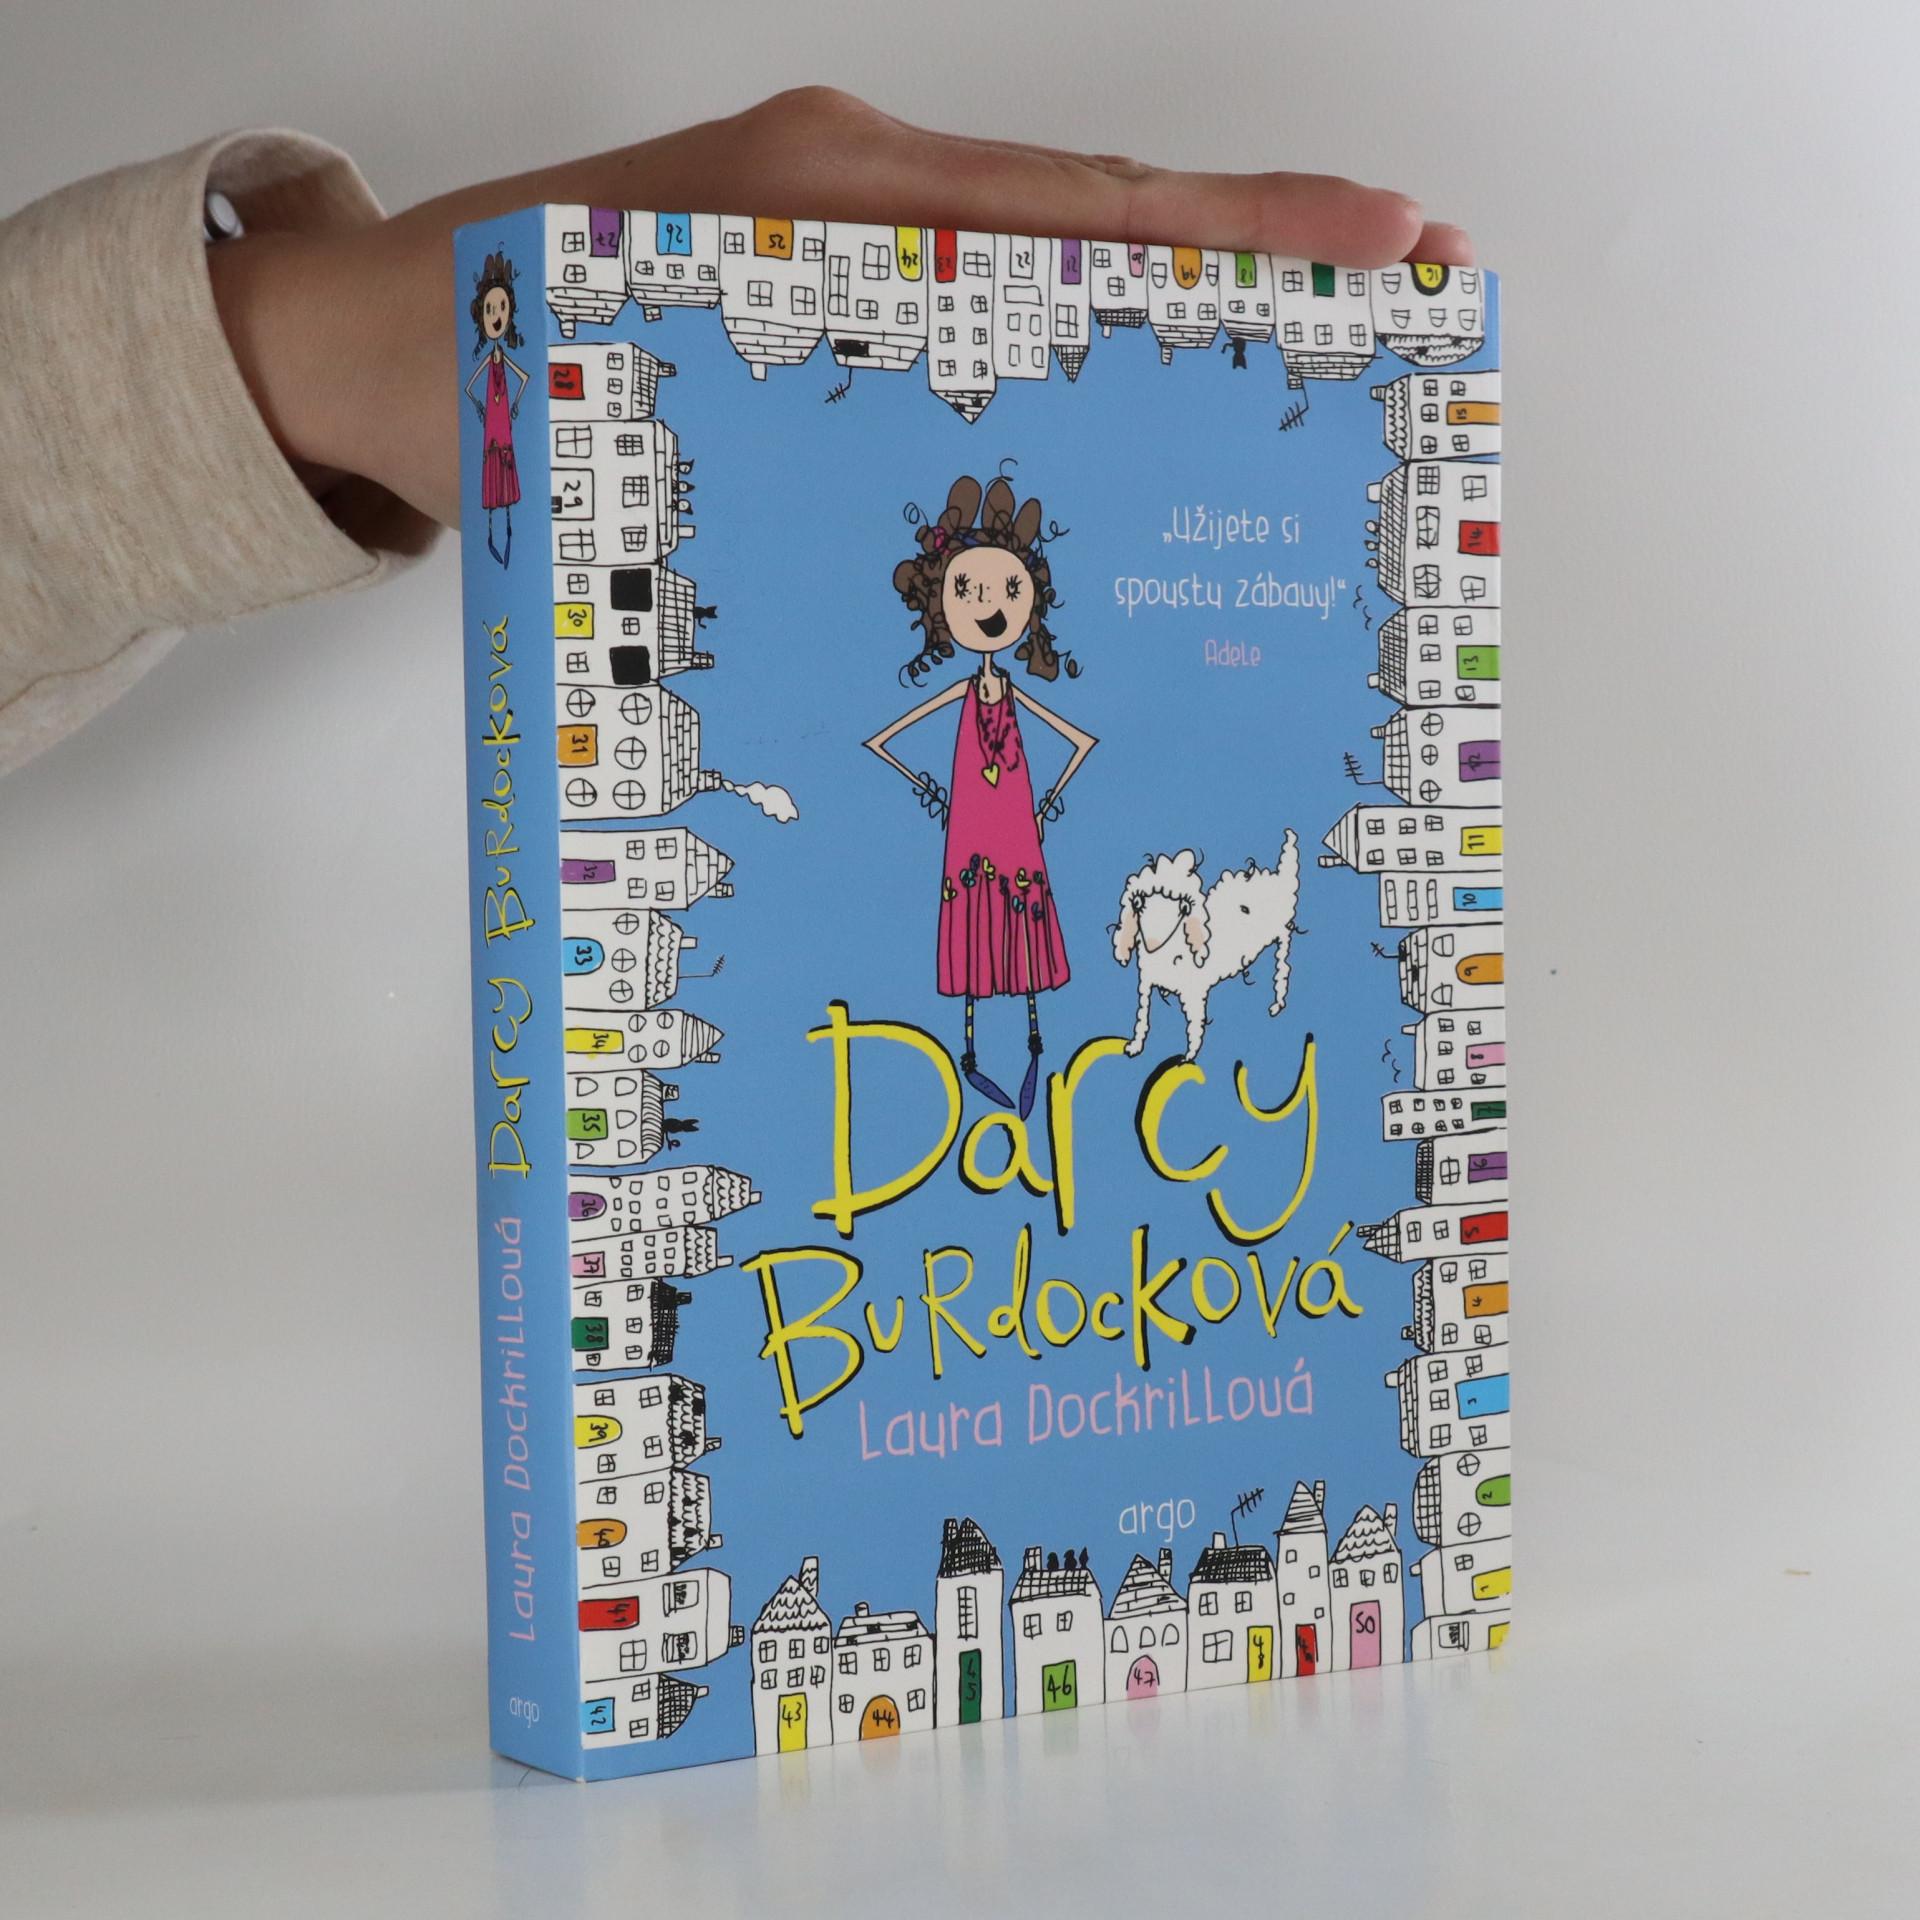 antikvární kniha Darcy Burdocková, 2014